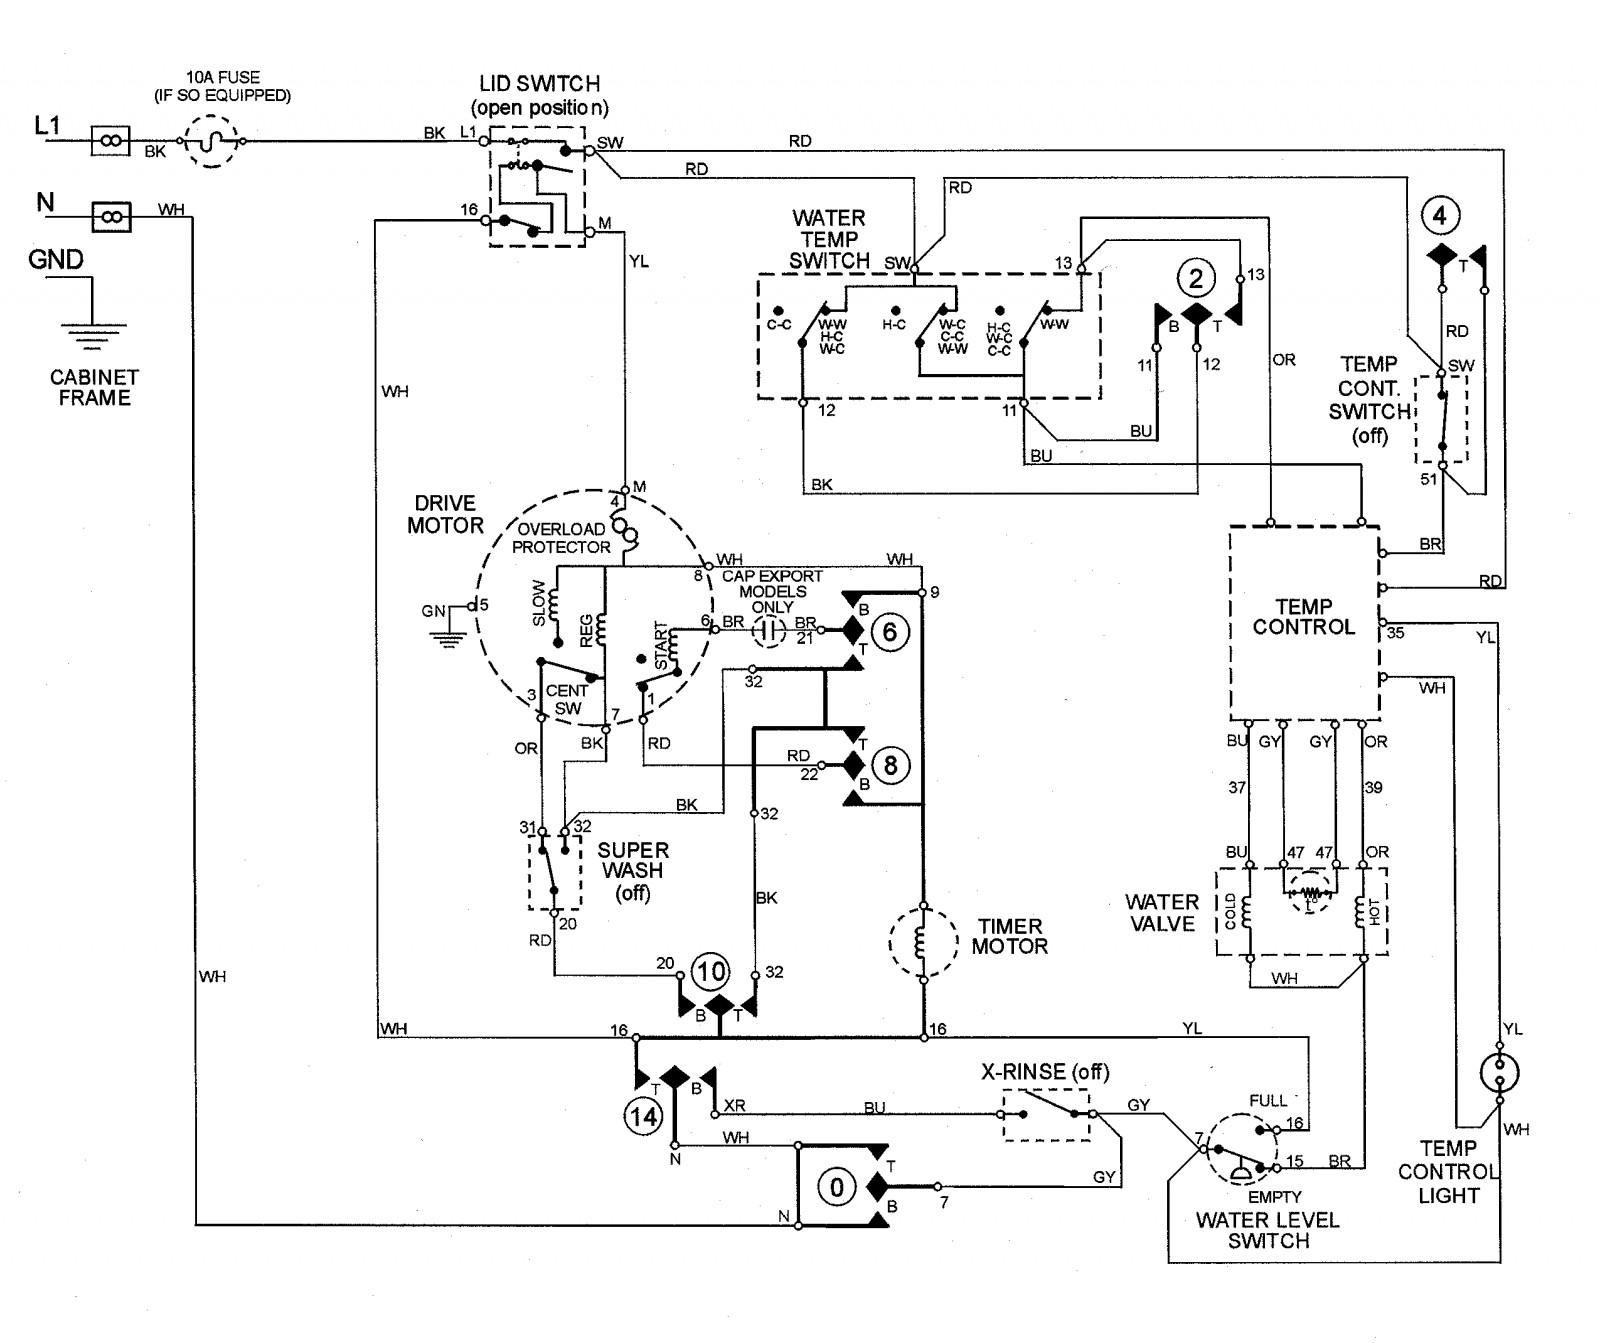 hight resolution of ge washer motor wiring diagram wiring diagram schematics bosch washer motor wiring diagram washer motor wiring diagram